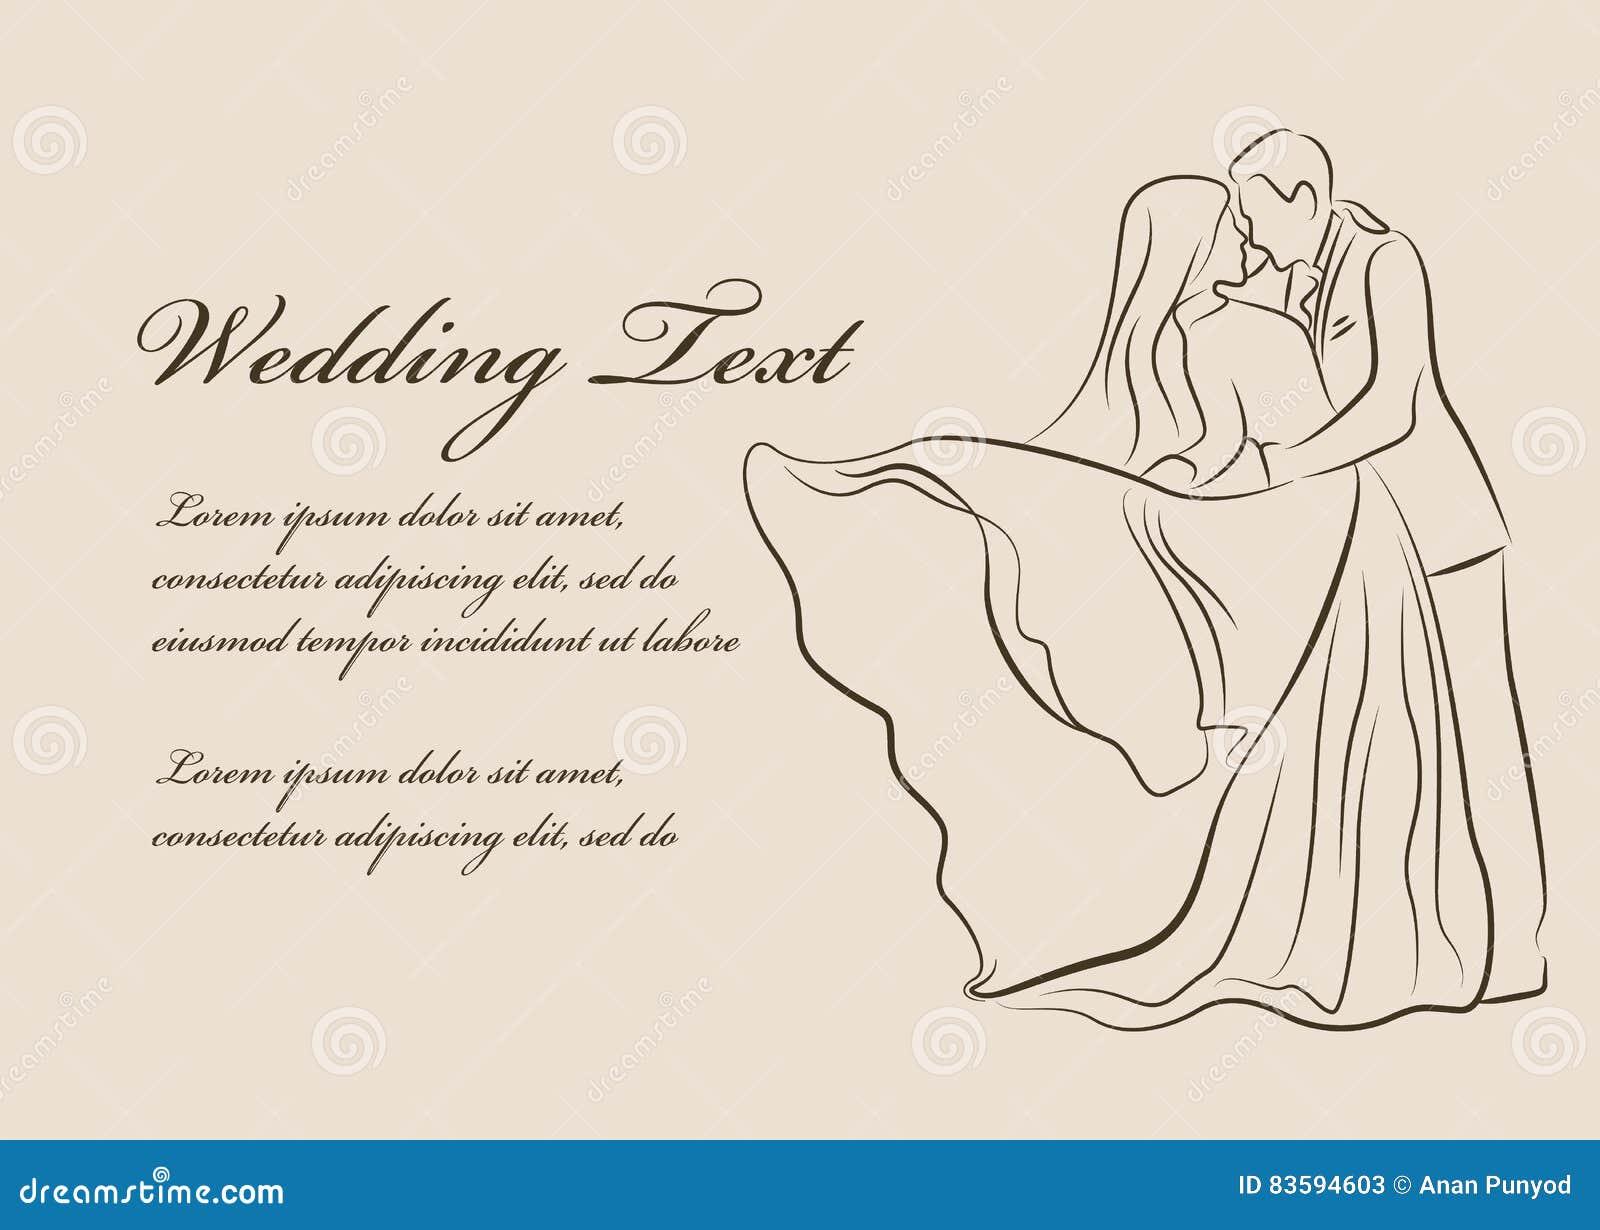 Wedding Invitation - Bride And Groom Are Kissing Line Border Vector ...